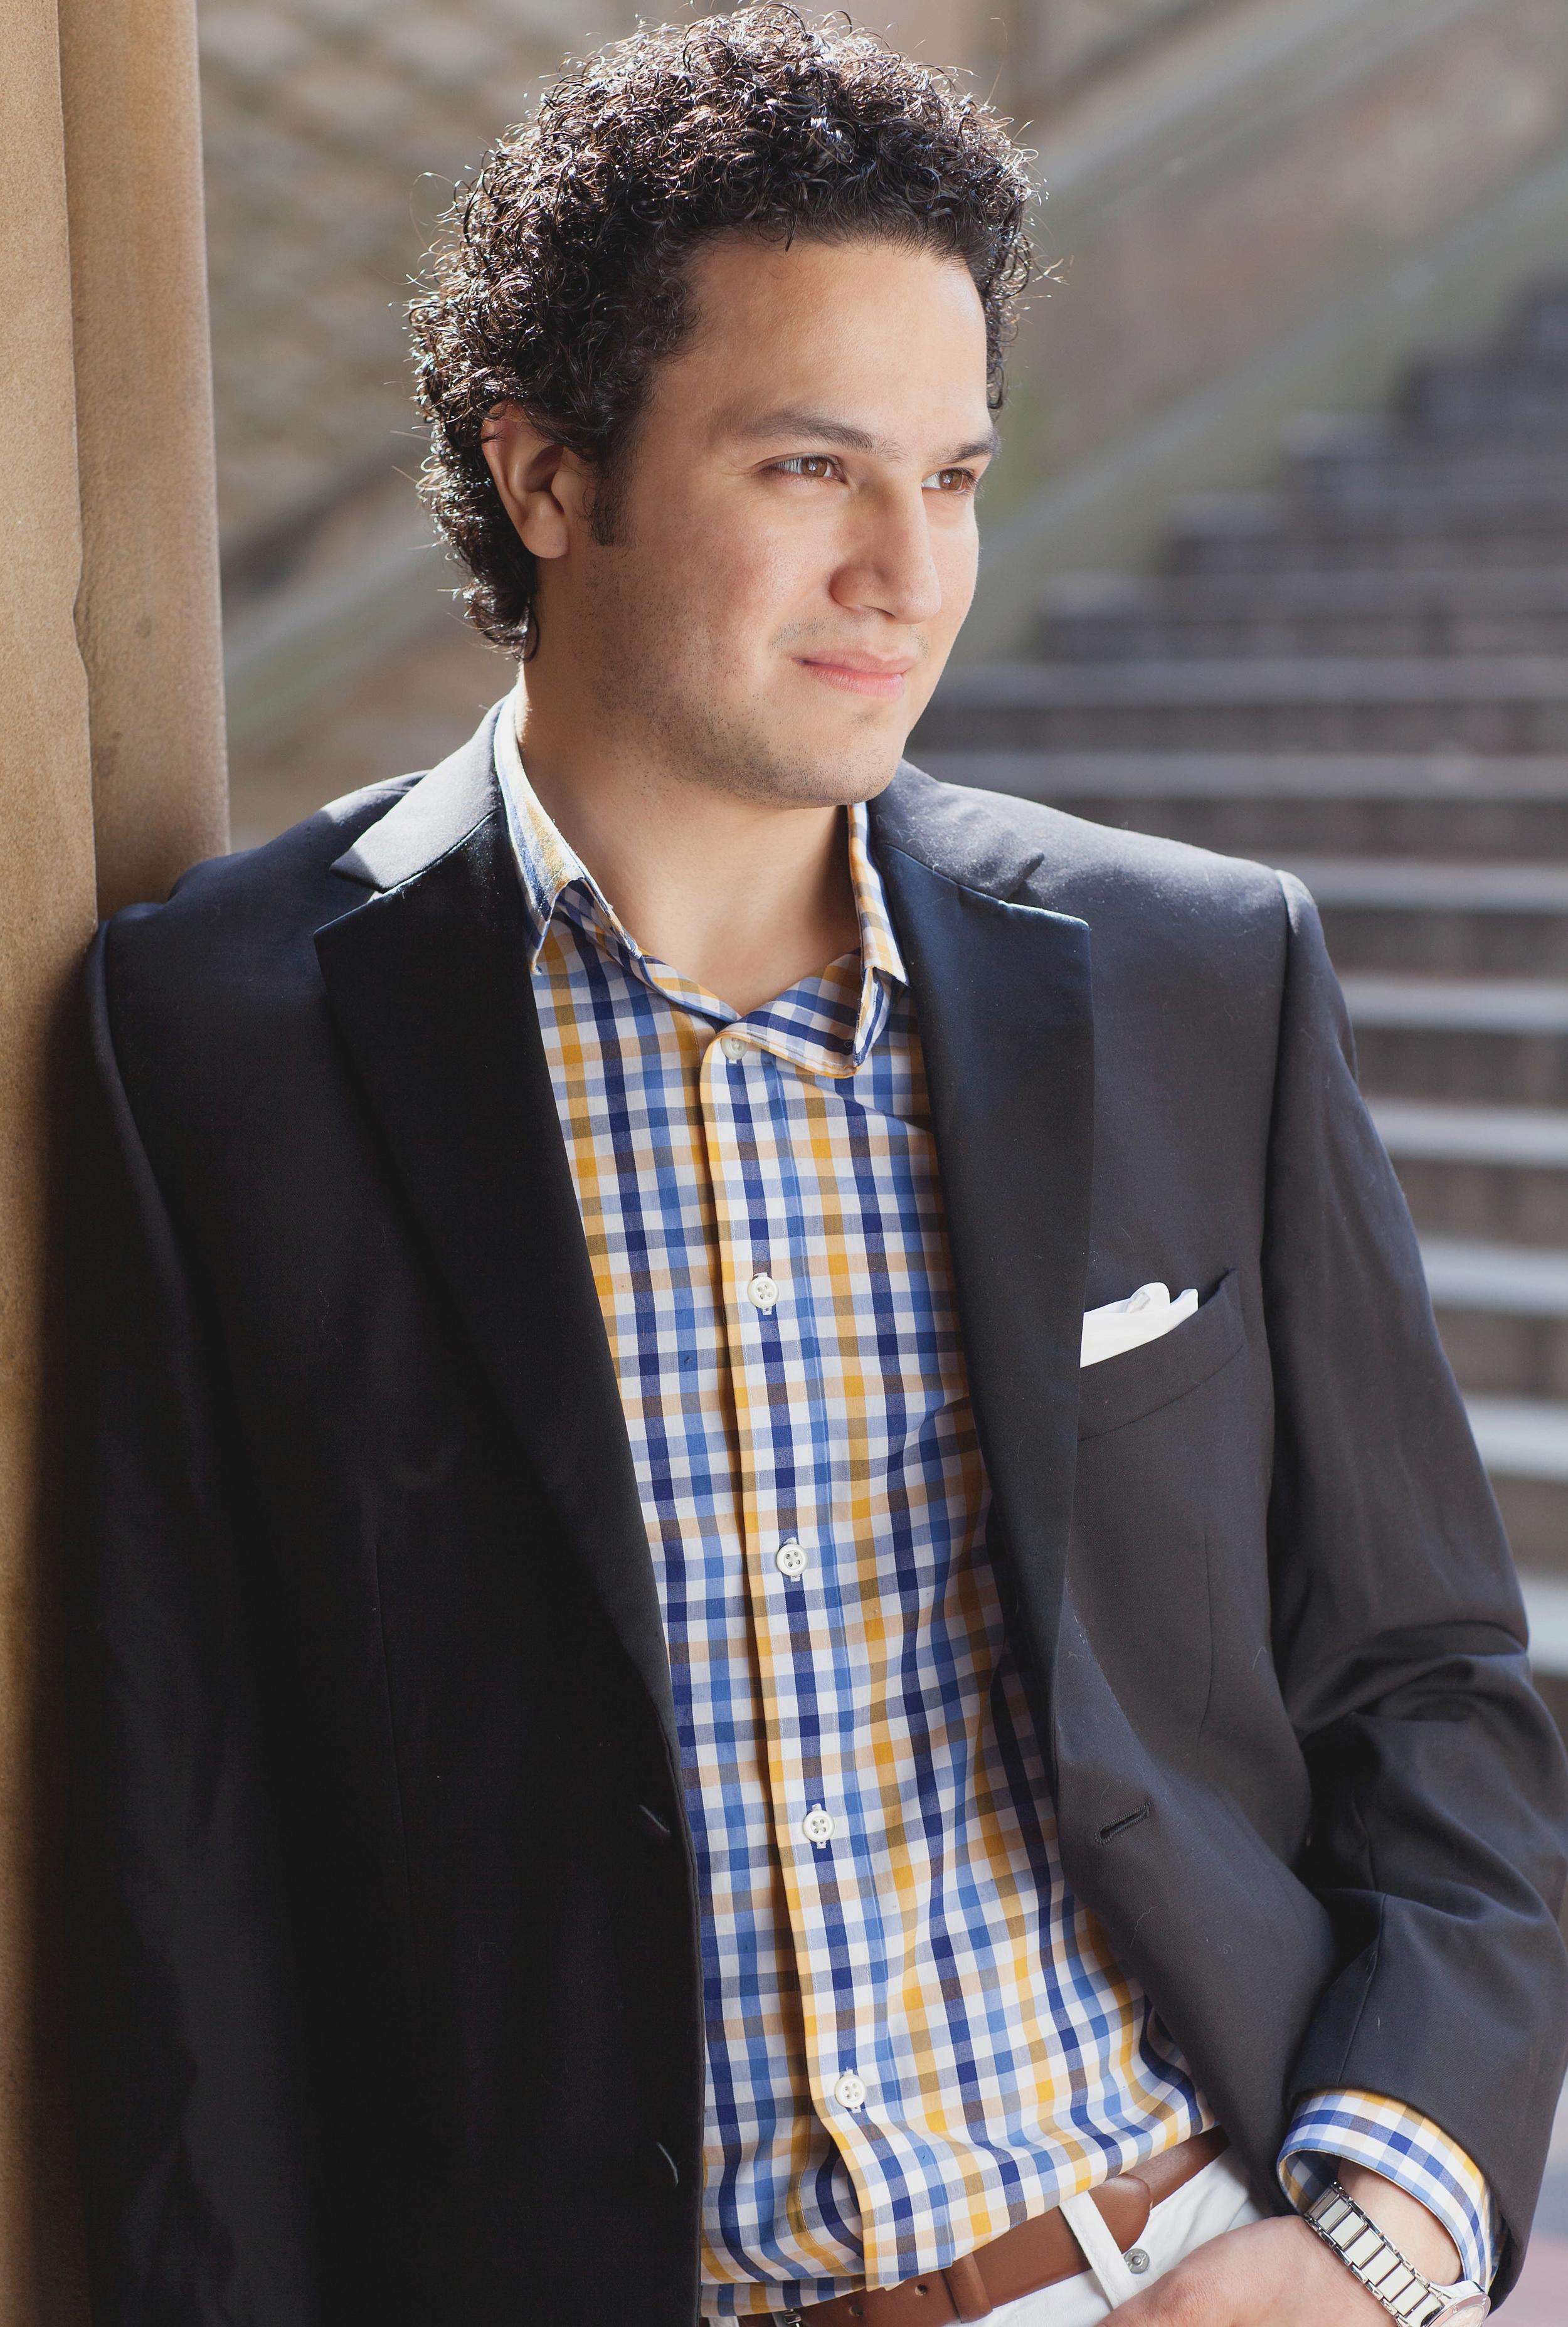 Pianist/Assistant Conductor:  Abdiel Vasquez